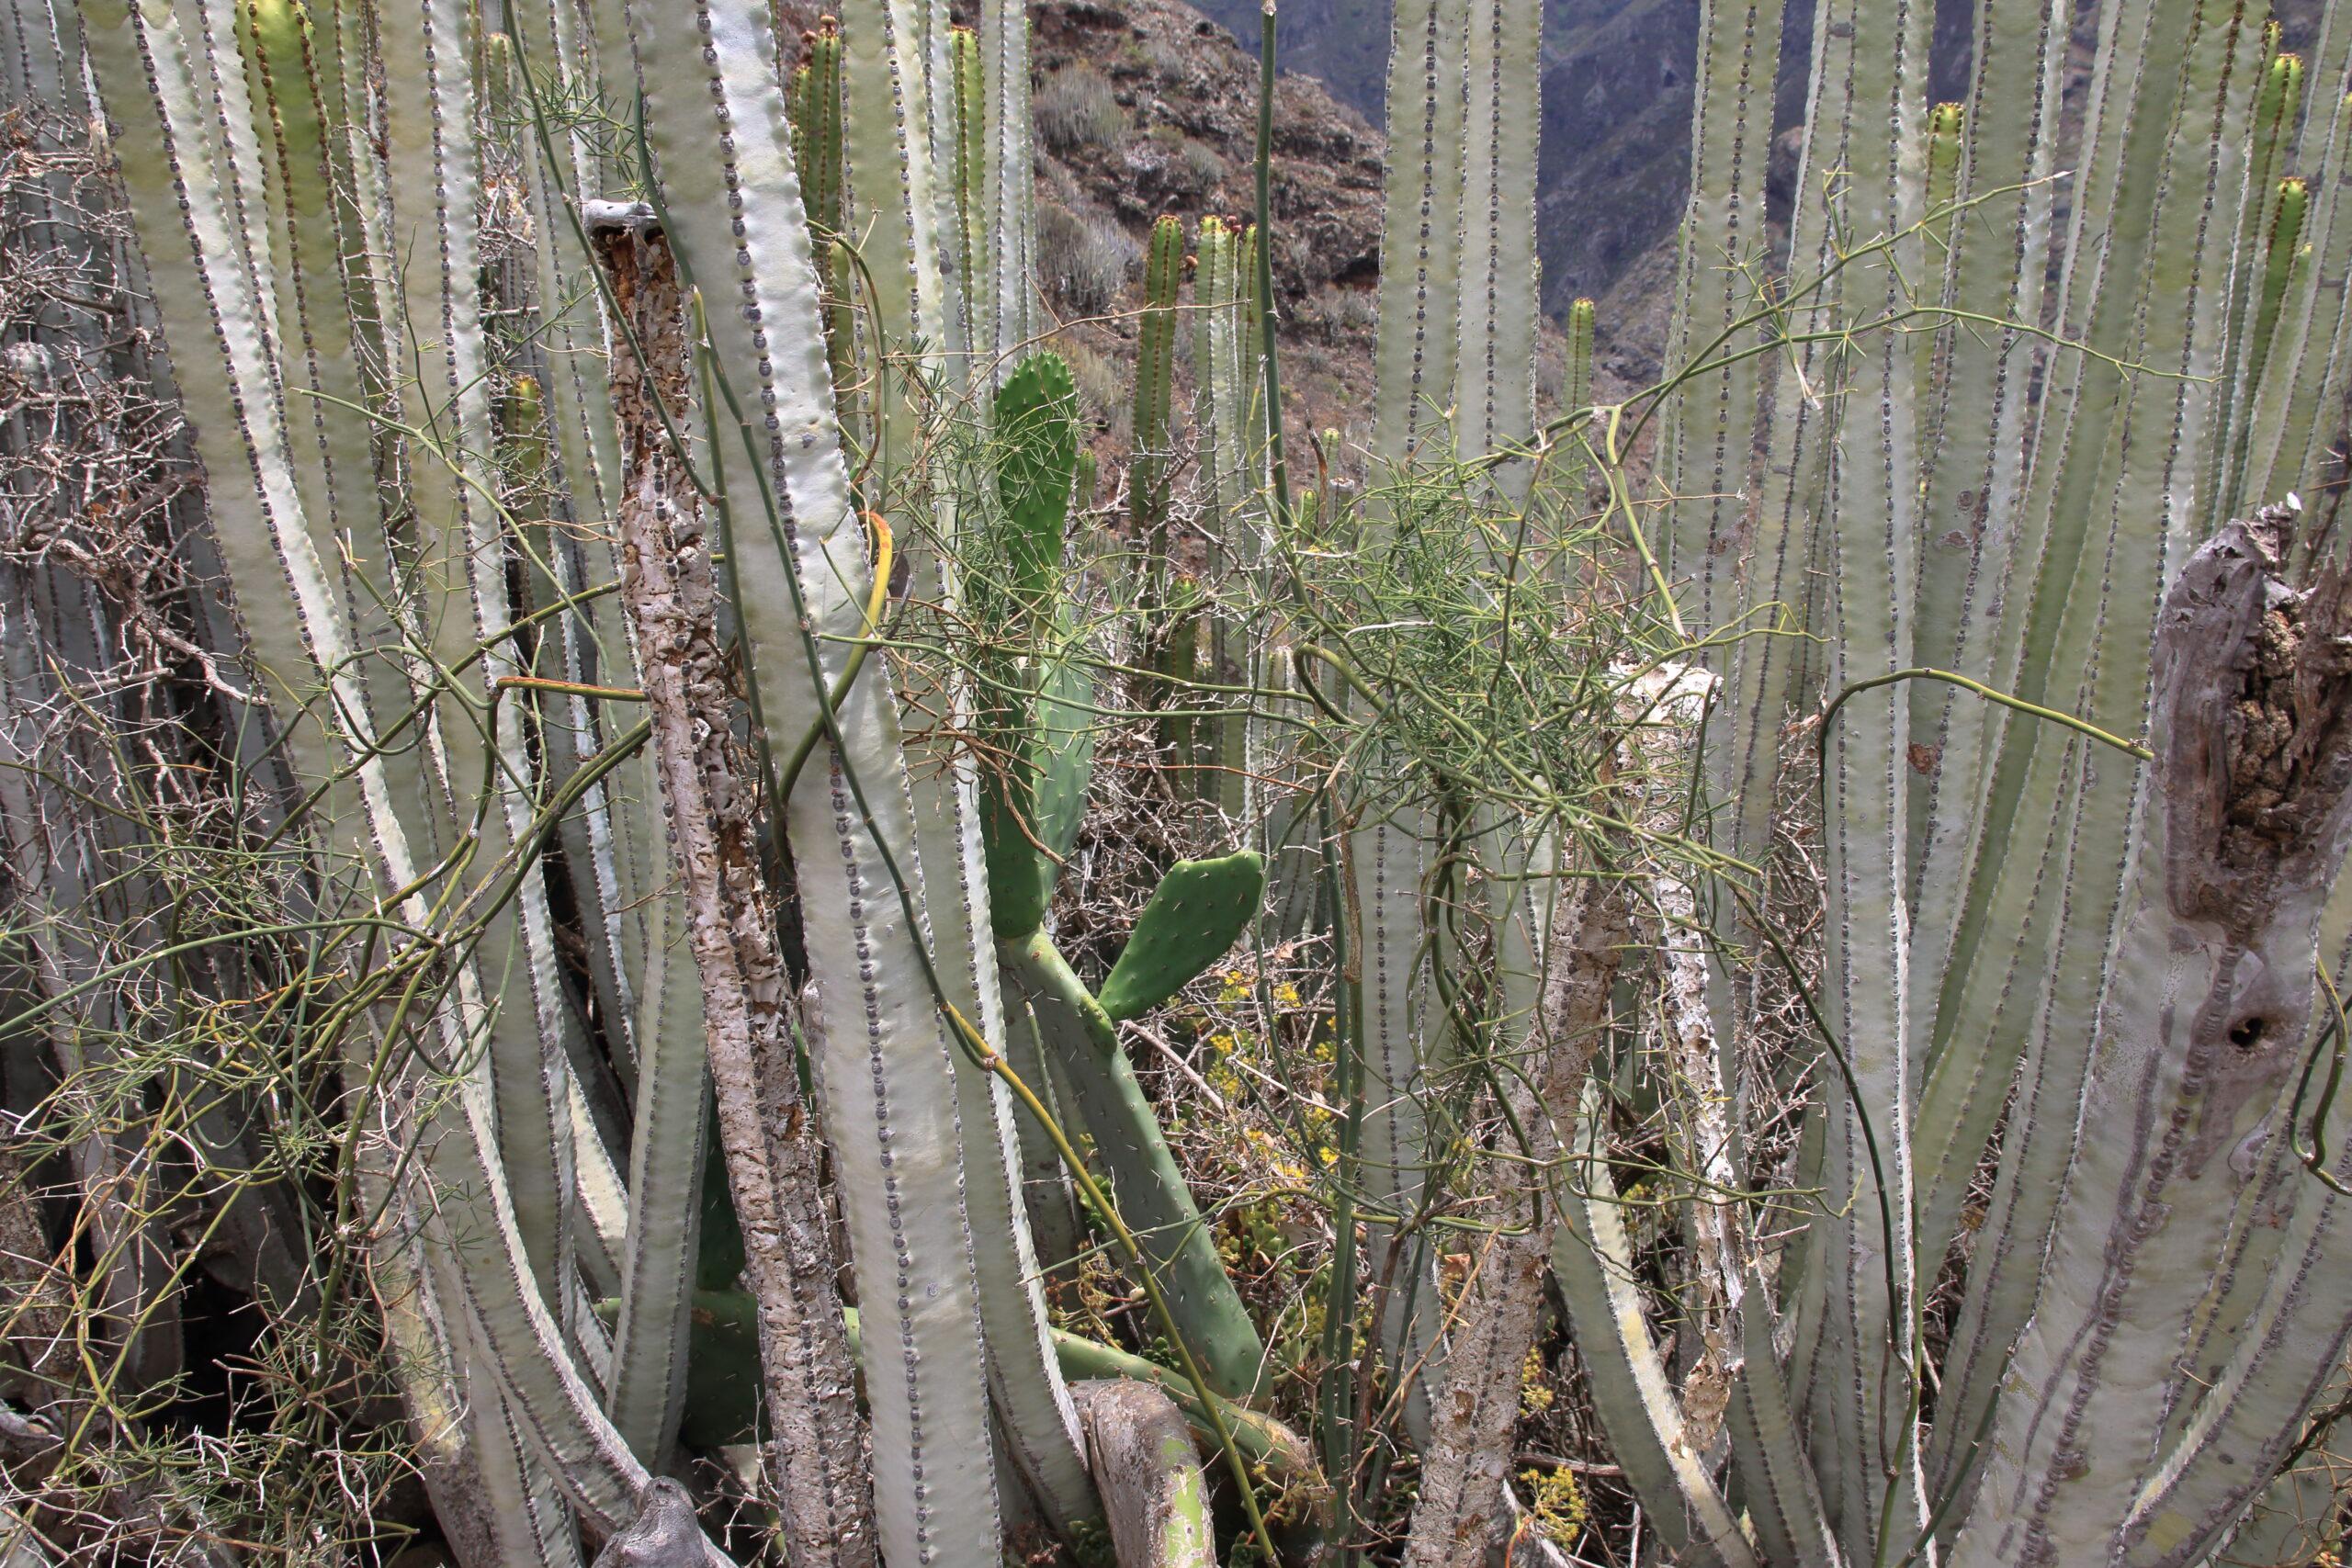 img_0418-2habitat-punta-chinamadaasparagus-umbellatus-subsp-scaled.jpg